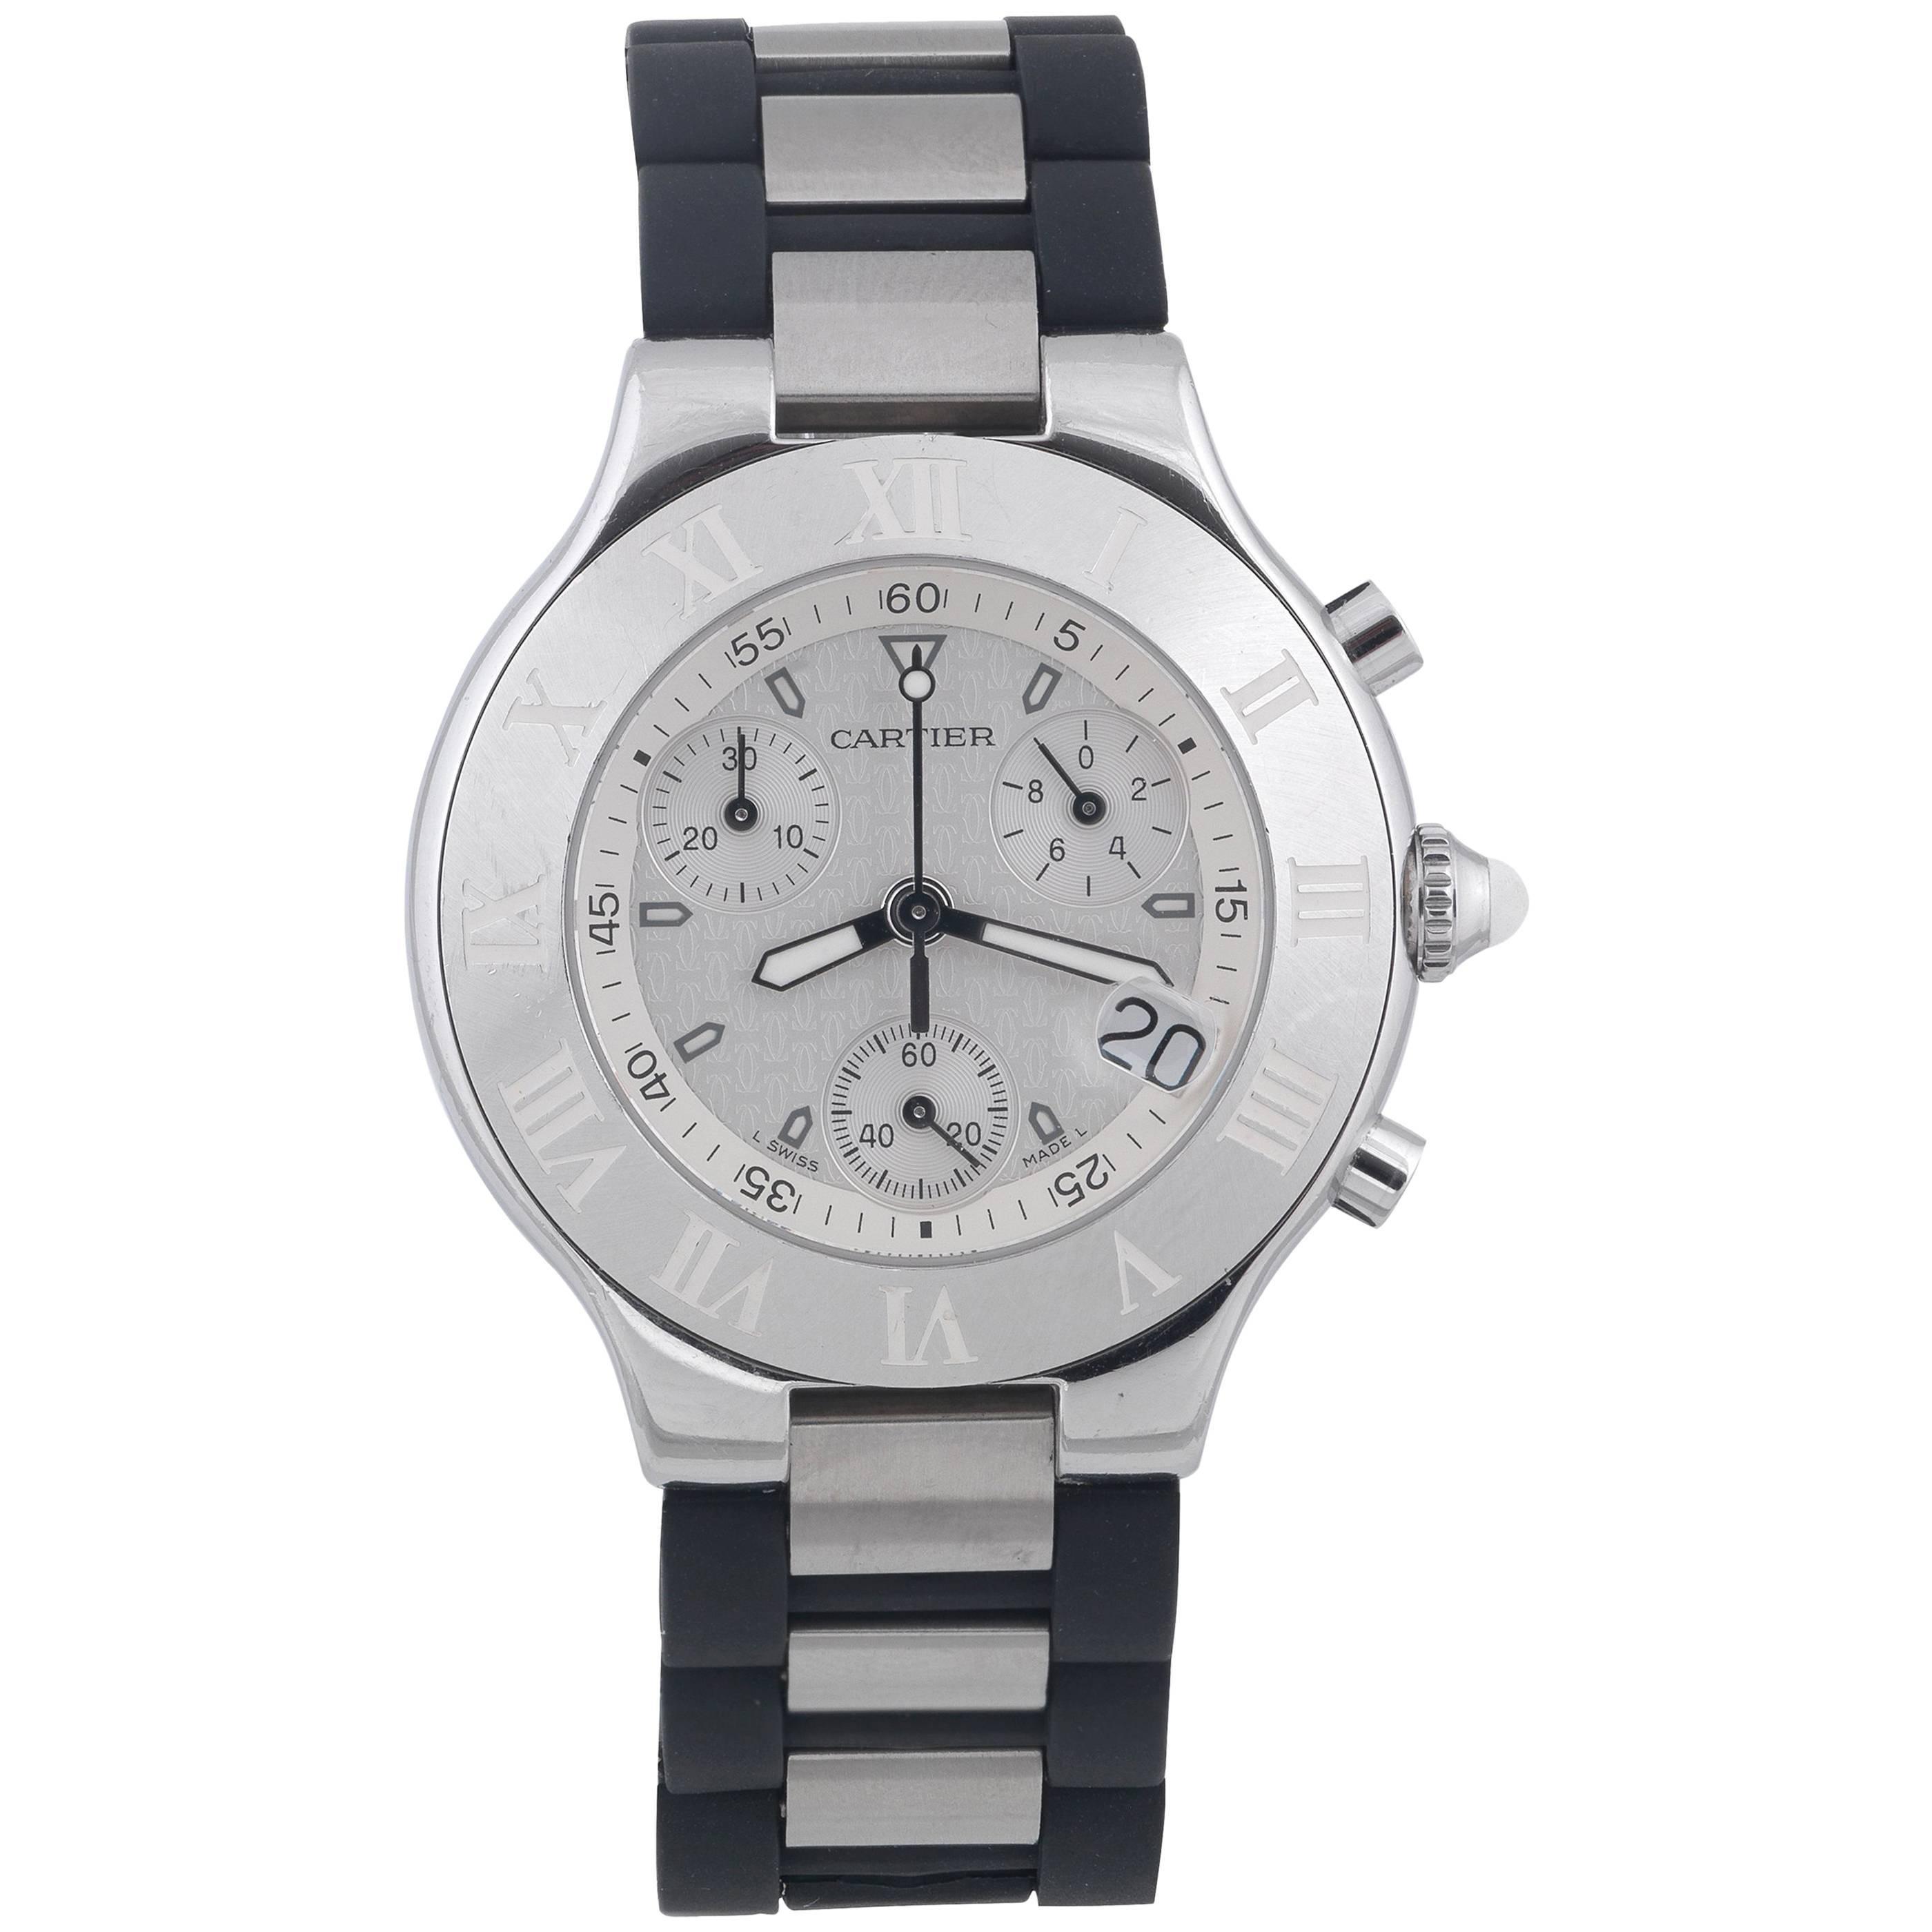 Cartier Stainless steel Chronoscaph 21 Chronograph quartz wristwatch